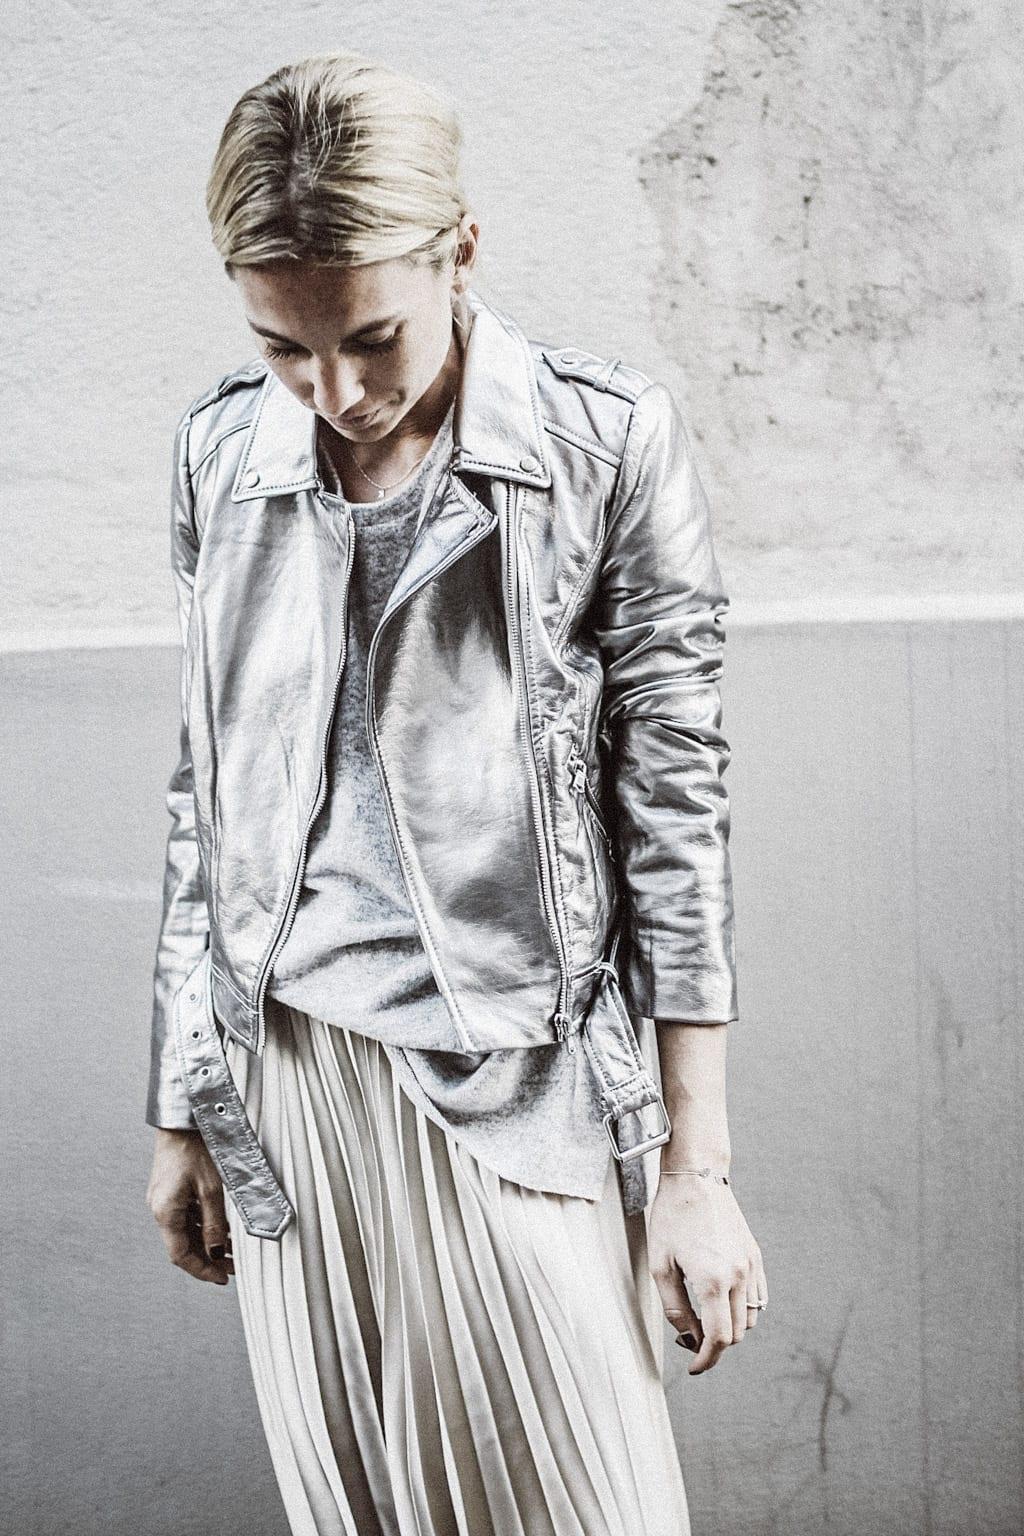 ck-constantlyk-com-karin-kaswurm-street-style-fashion-silver-leather-jacket-plissee-6969